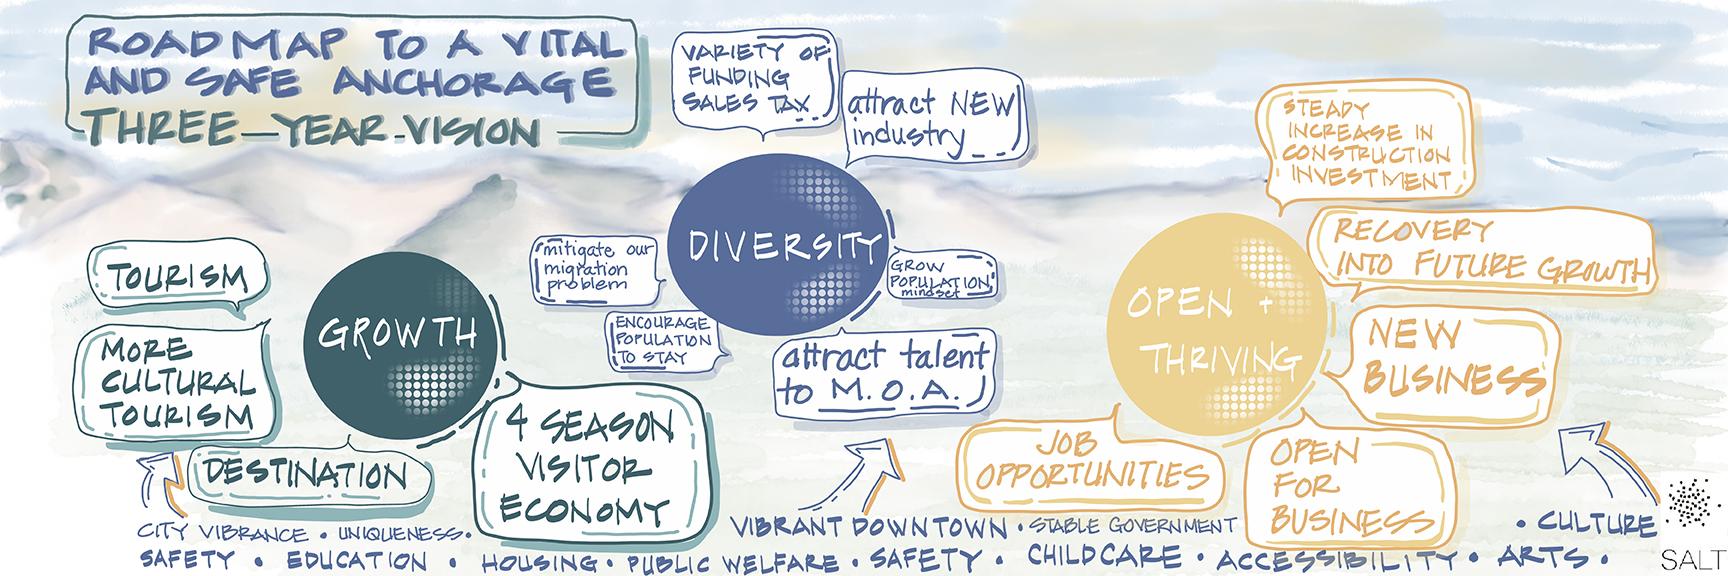 01_Vision Graphic